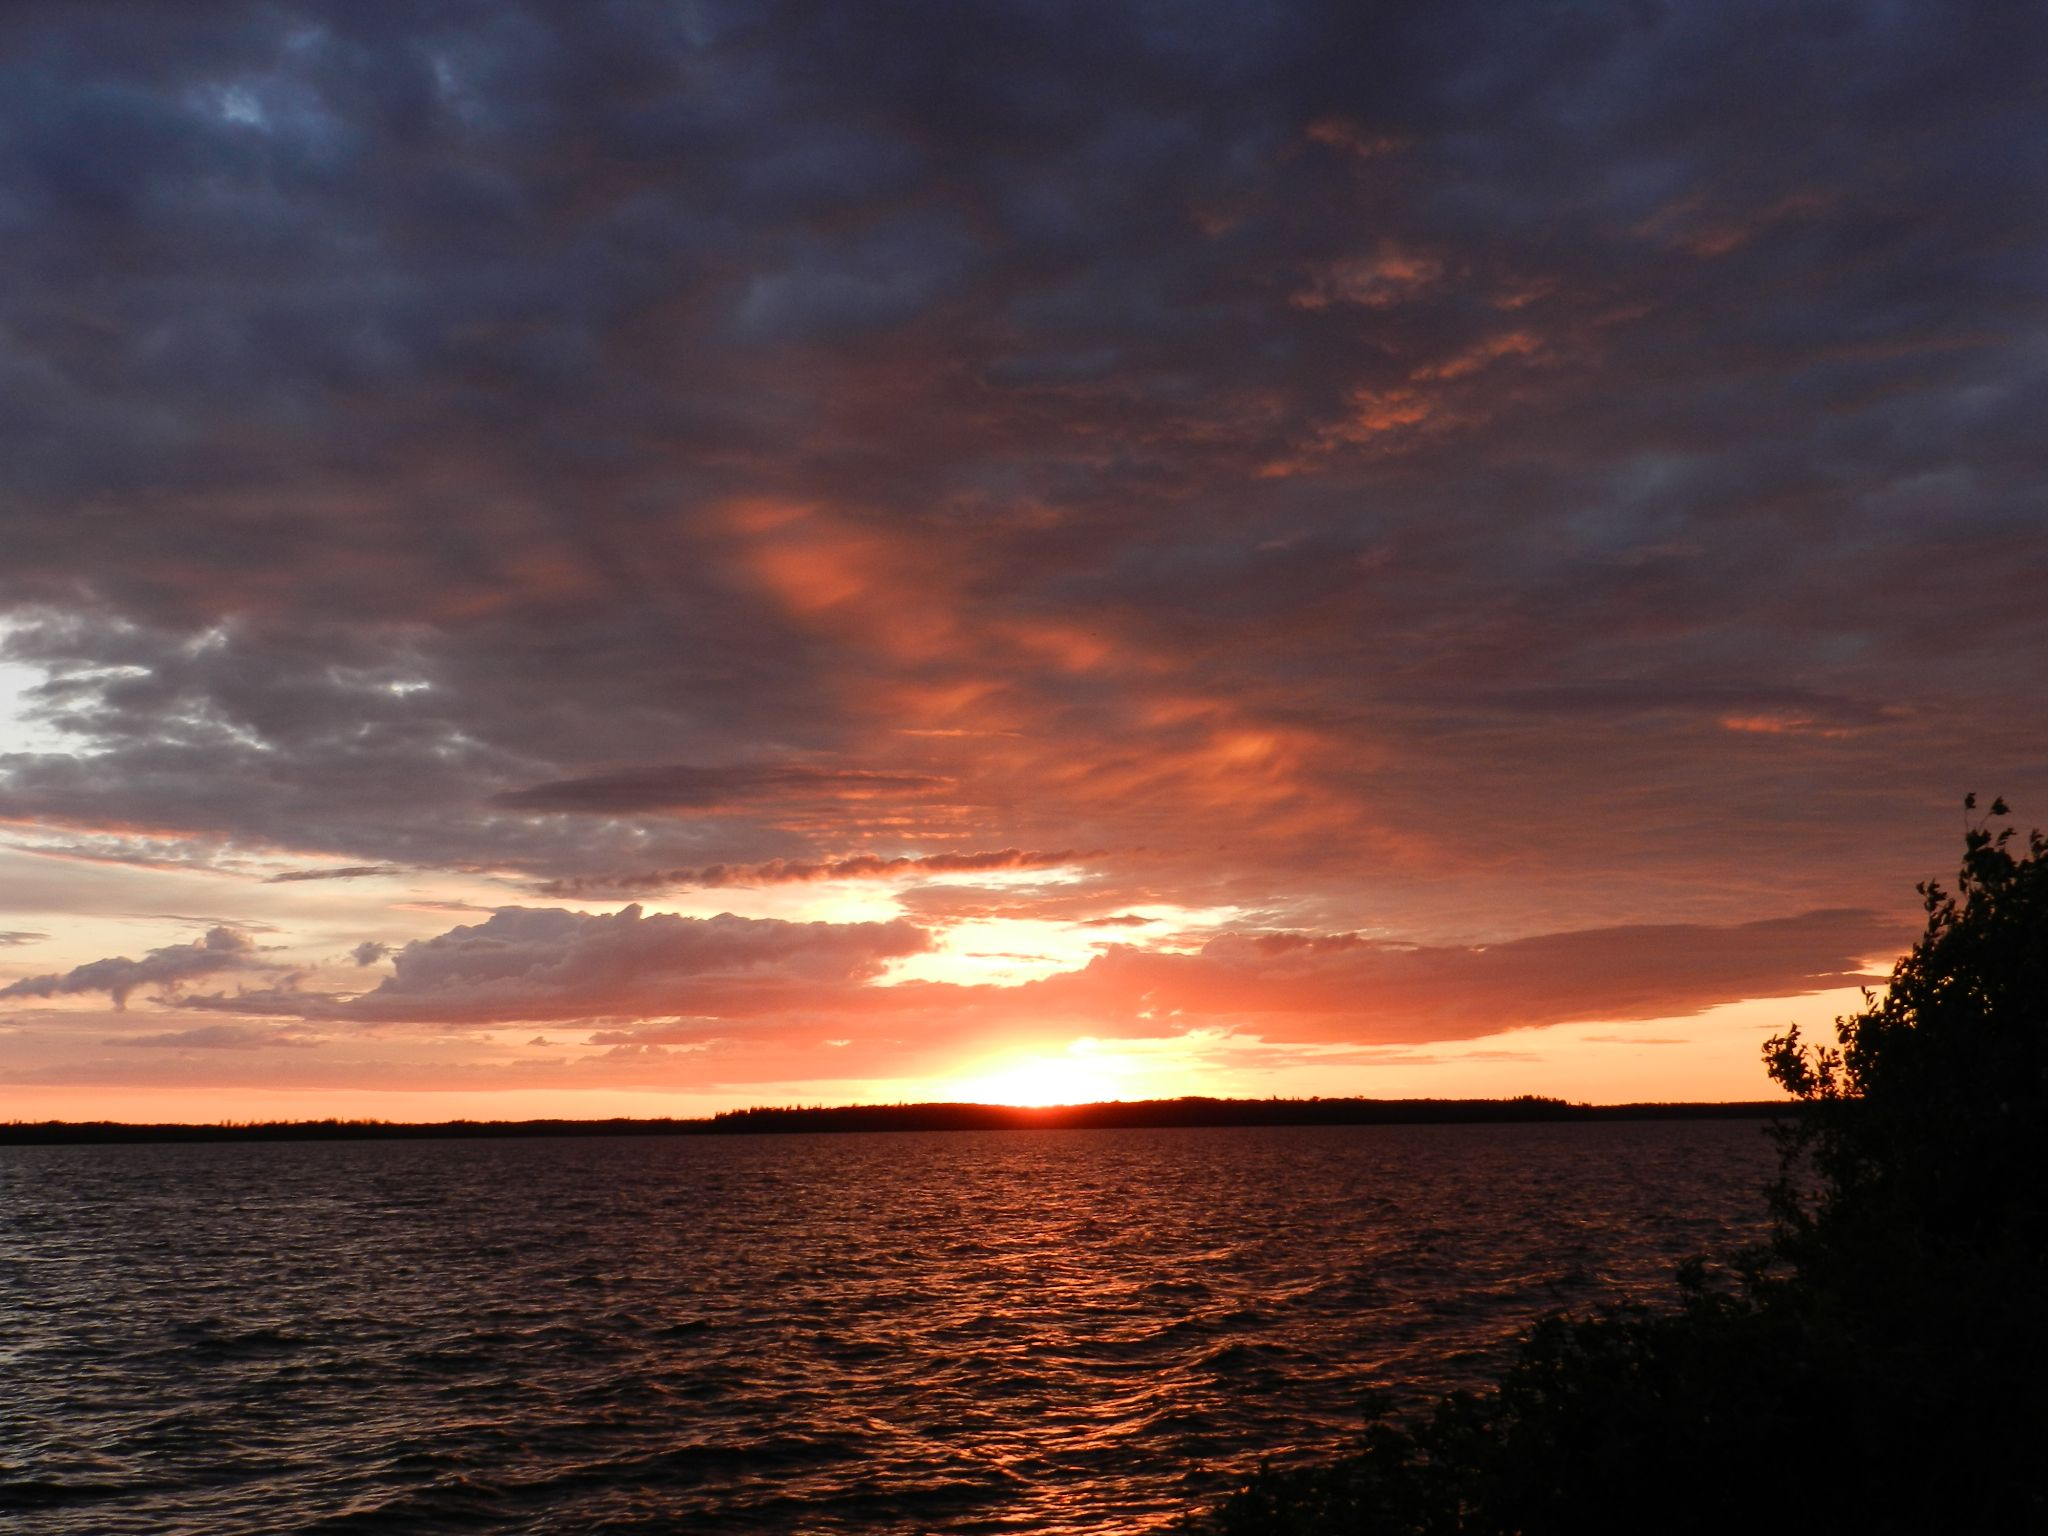 Sunset by Annette McCann